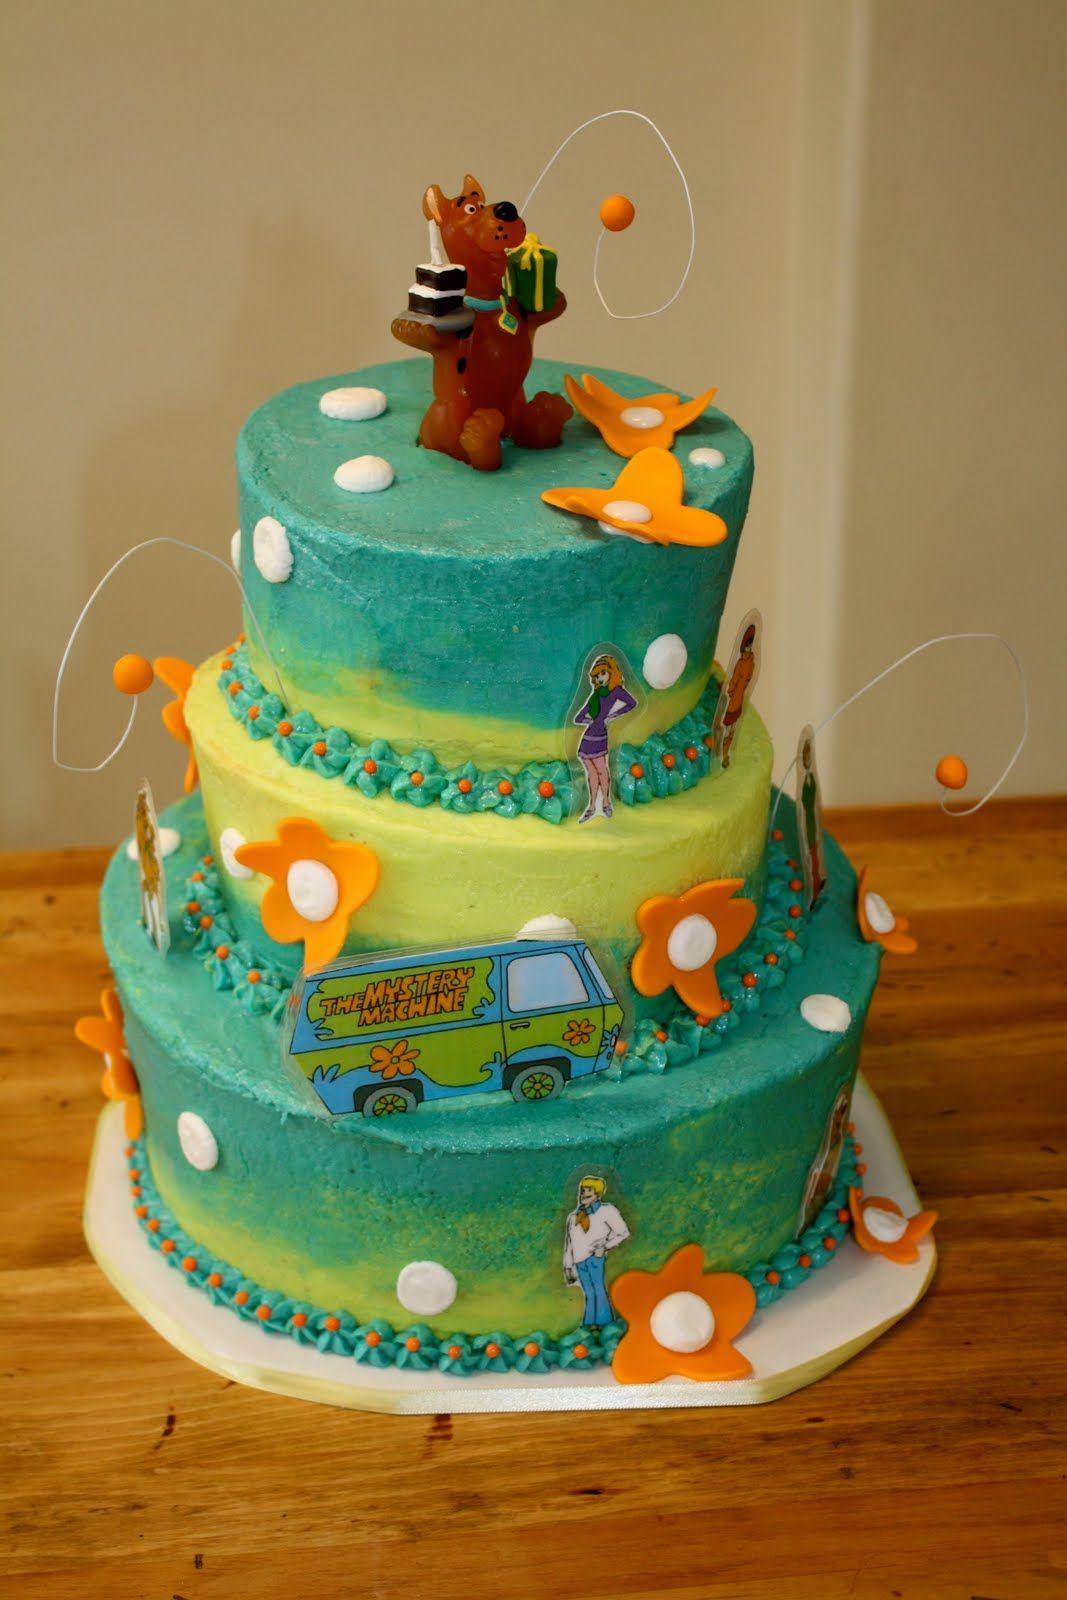 The Scooby Doo Cake